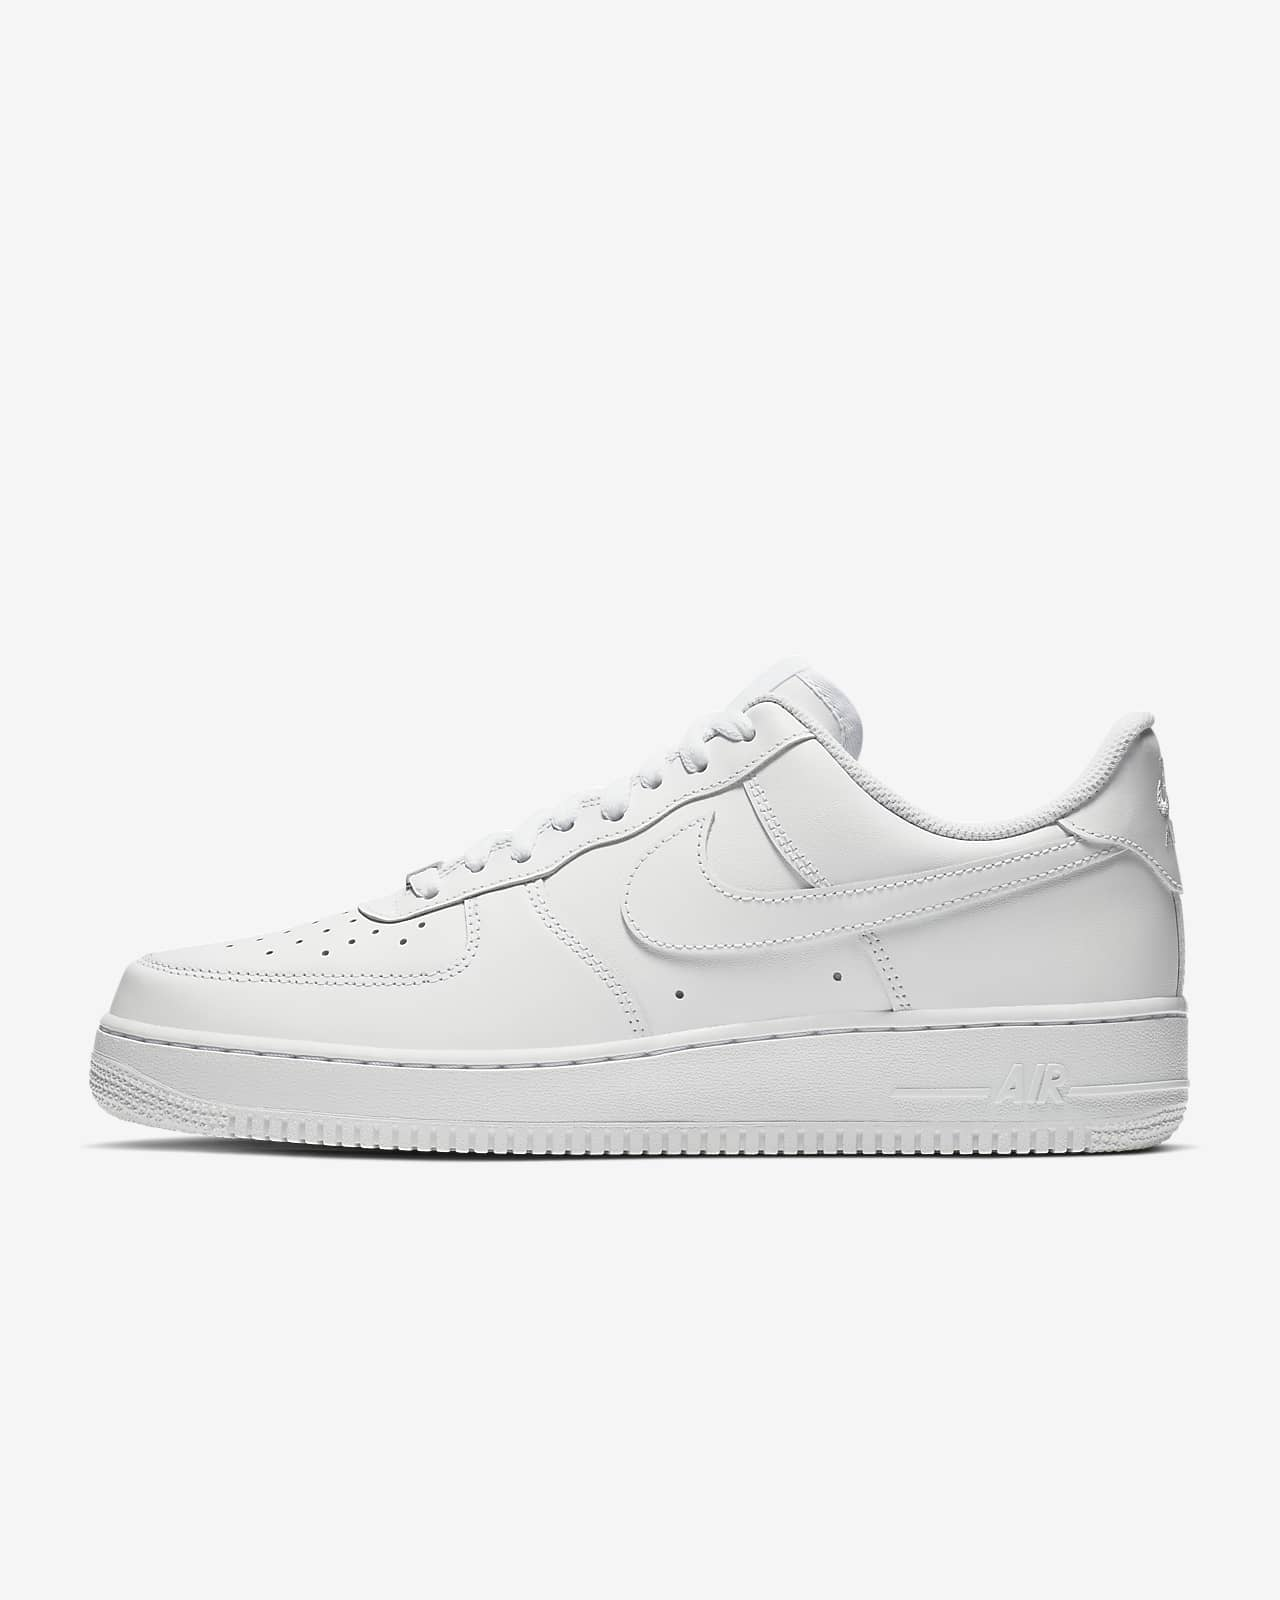 nike air force 1 white prezzo